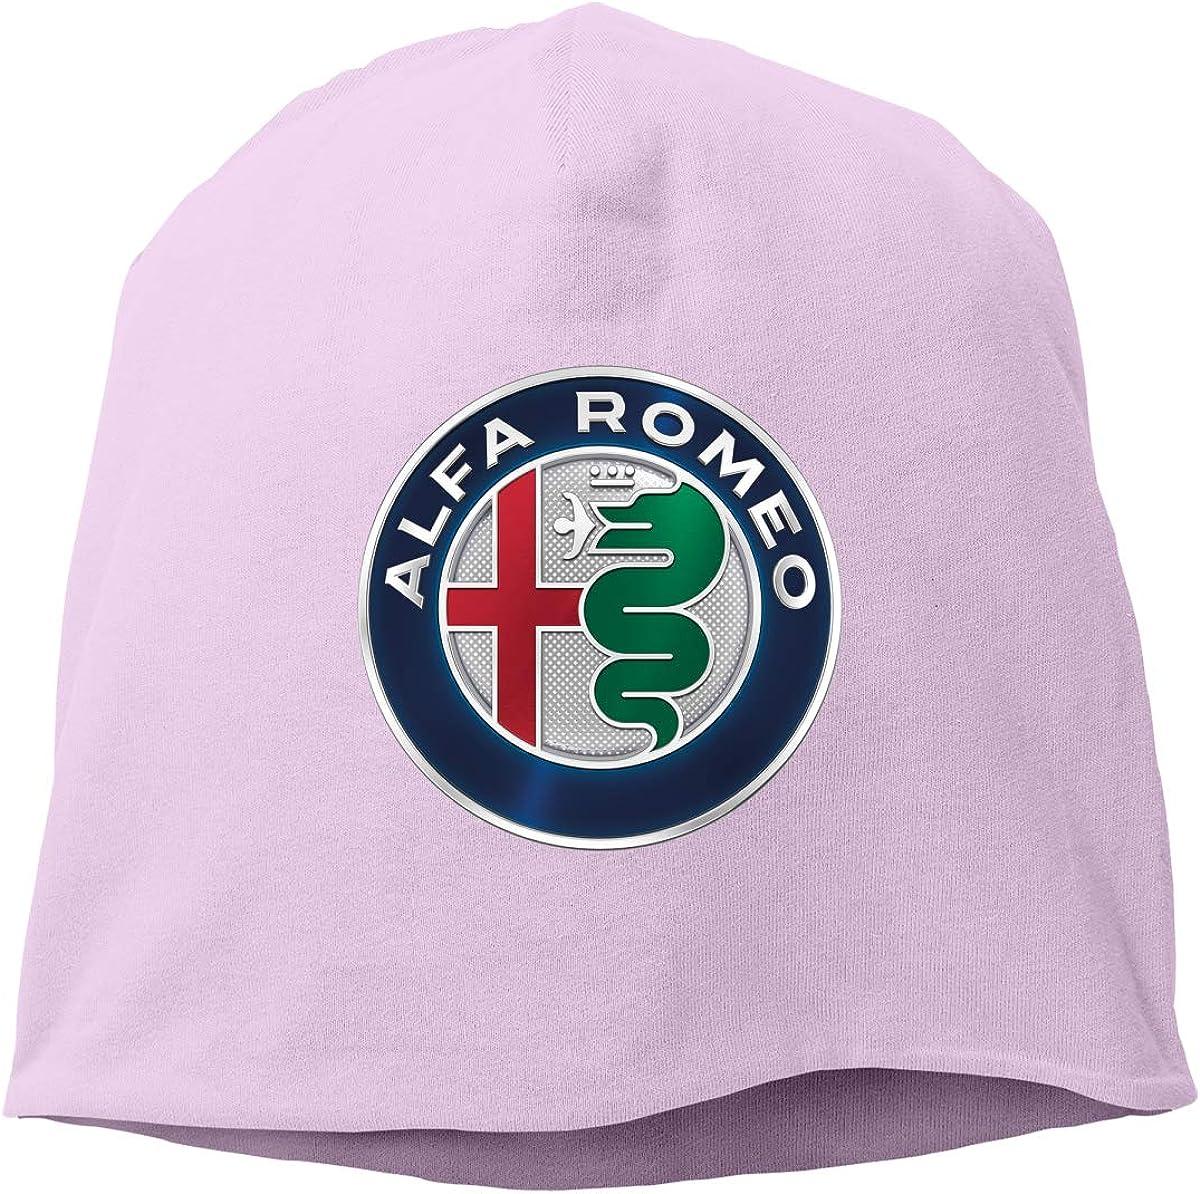 Al-FA Ro-meo Beanie Hats Winter Outdoor Fashion Slouchy Warm Caps for Mens&Womens